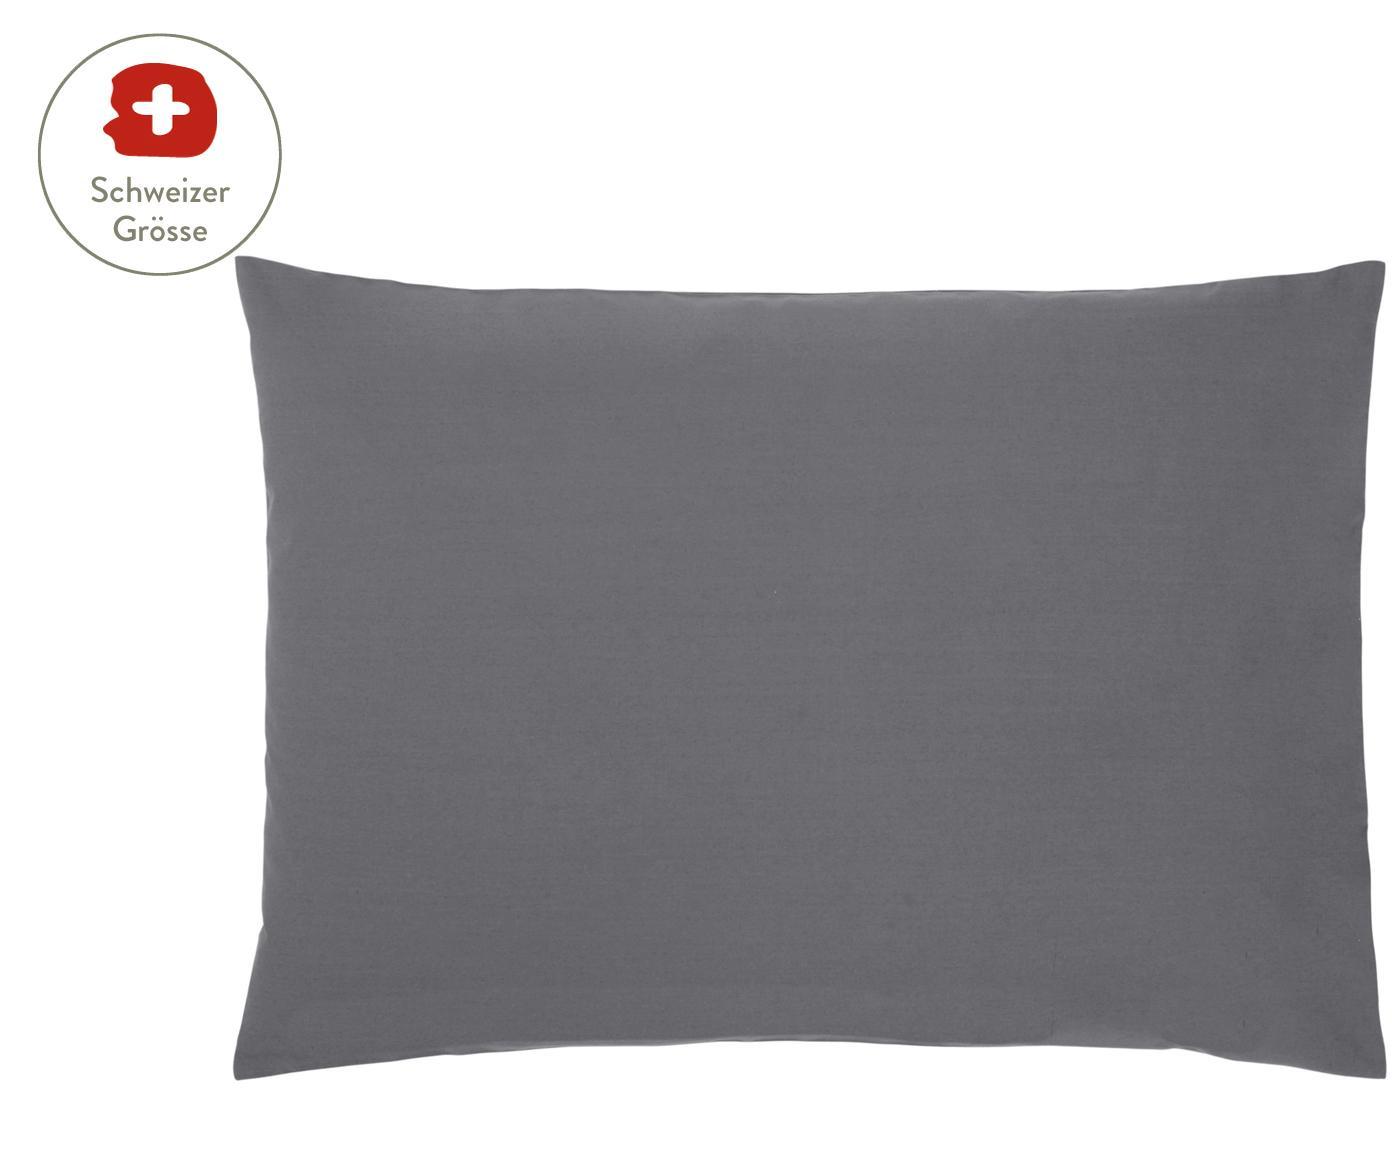 Baumwollperkal-Kissenbezug Elsie in Dunkelgrau, Webart: Perkal Fadendichte 200 TC, Dunkelgrau, 50 x 70 cm